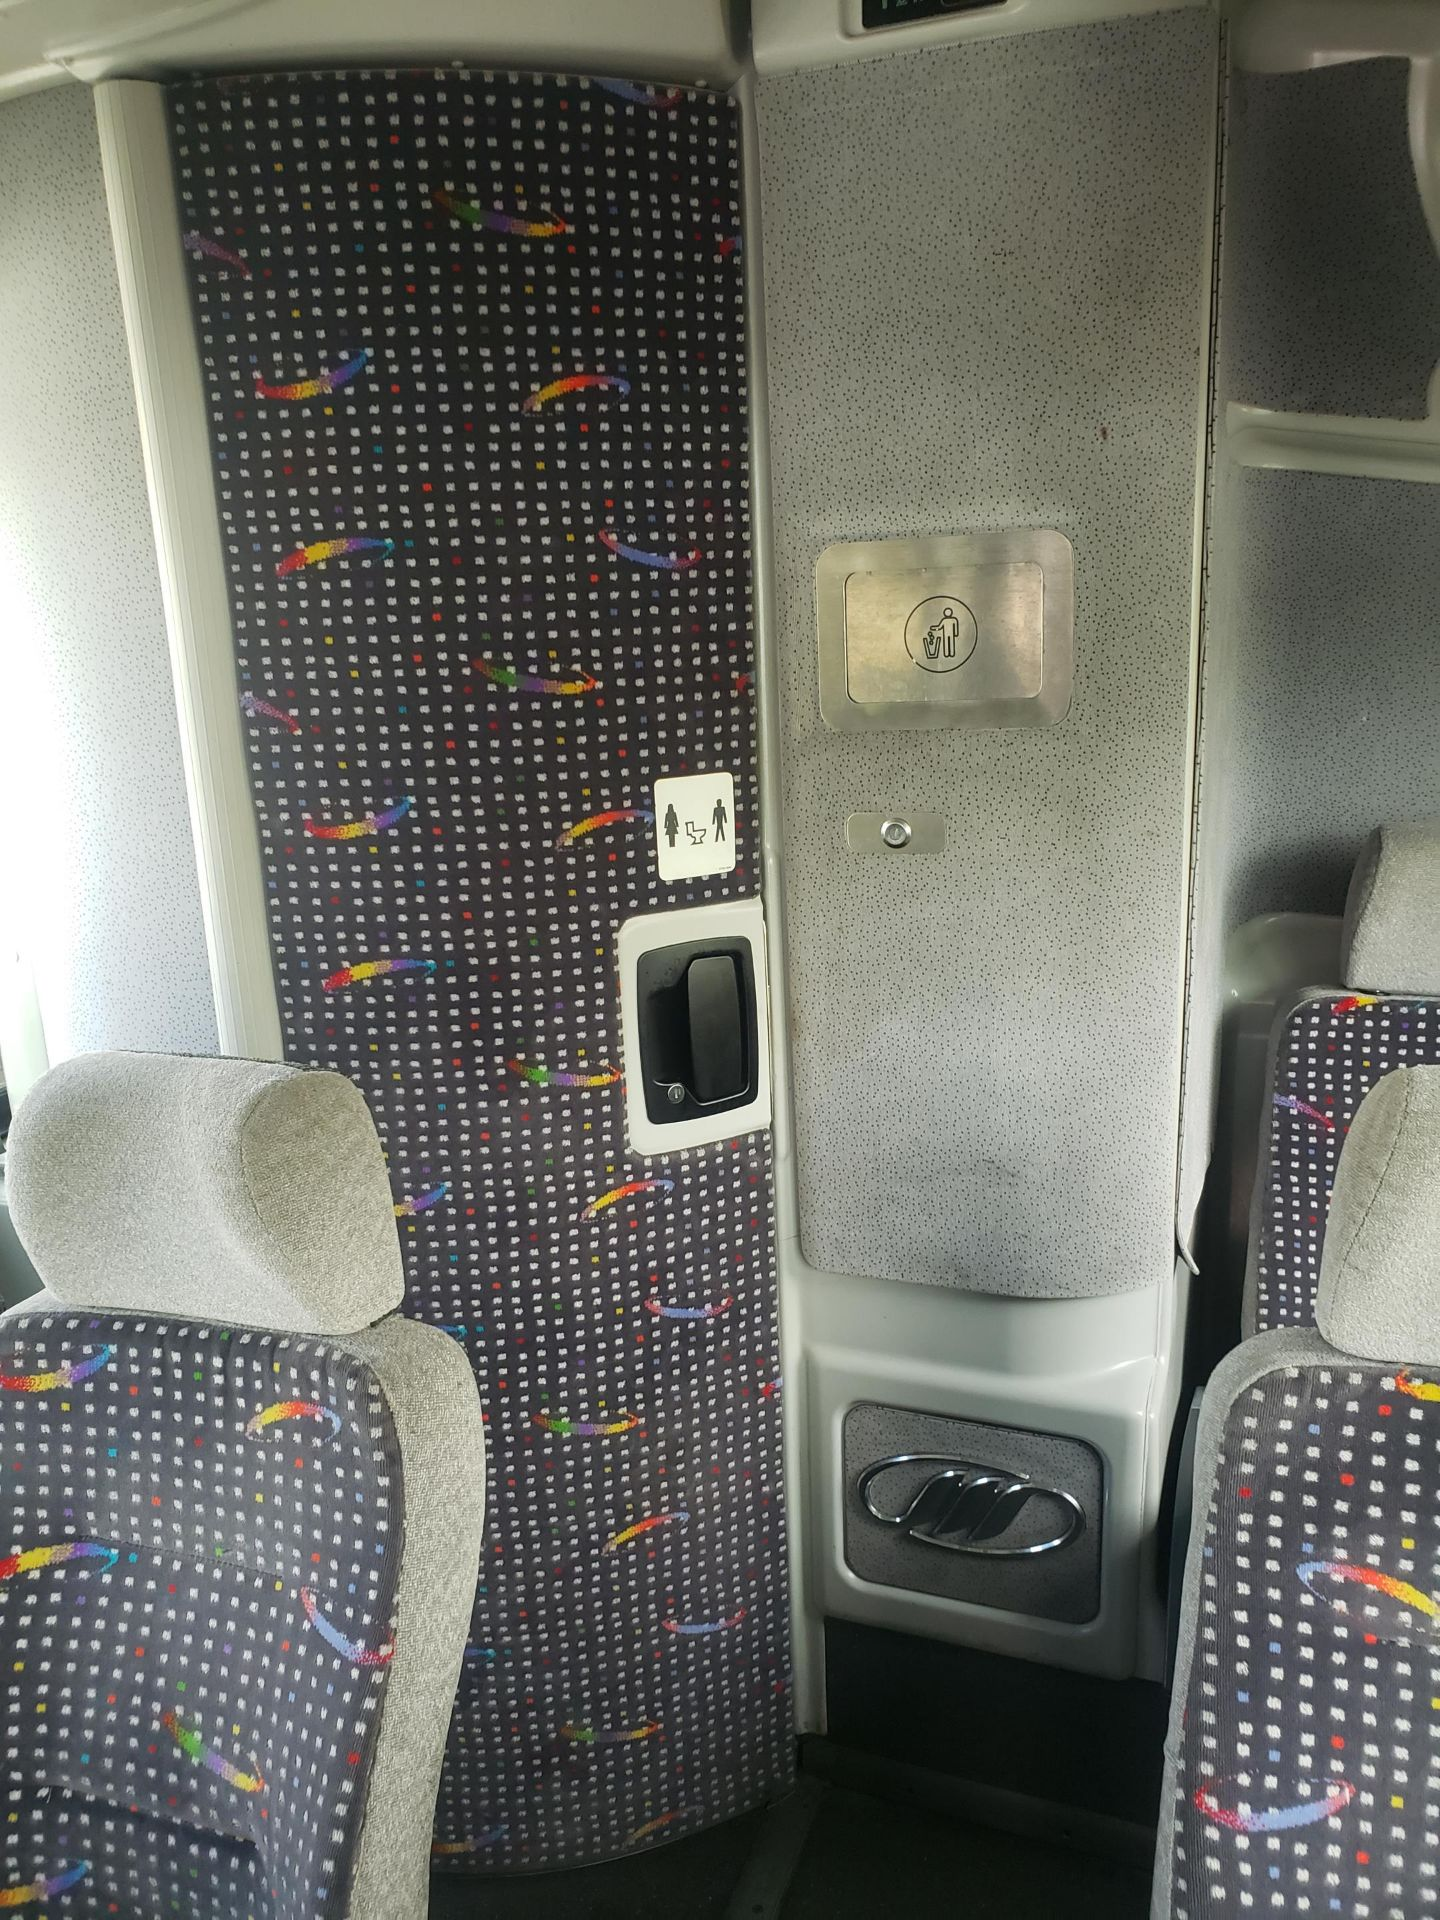 2010 MCI J4500 56-Pass Kneeling Coach Bus - Image 9 of 16